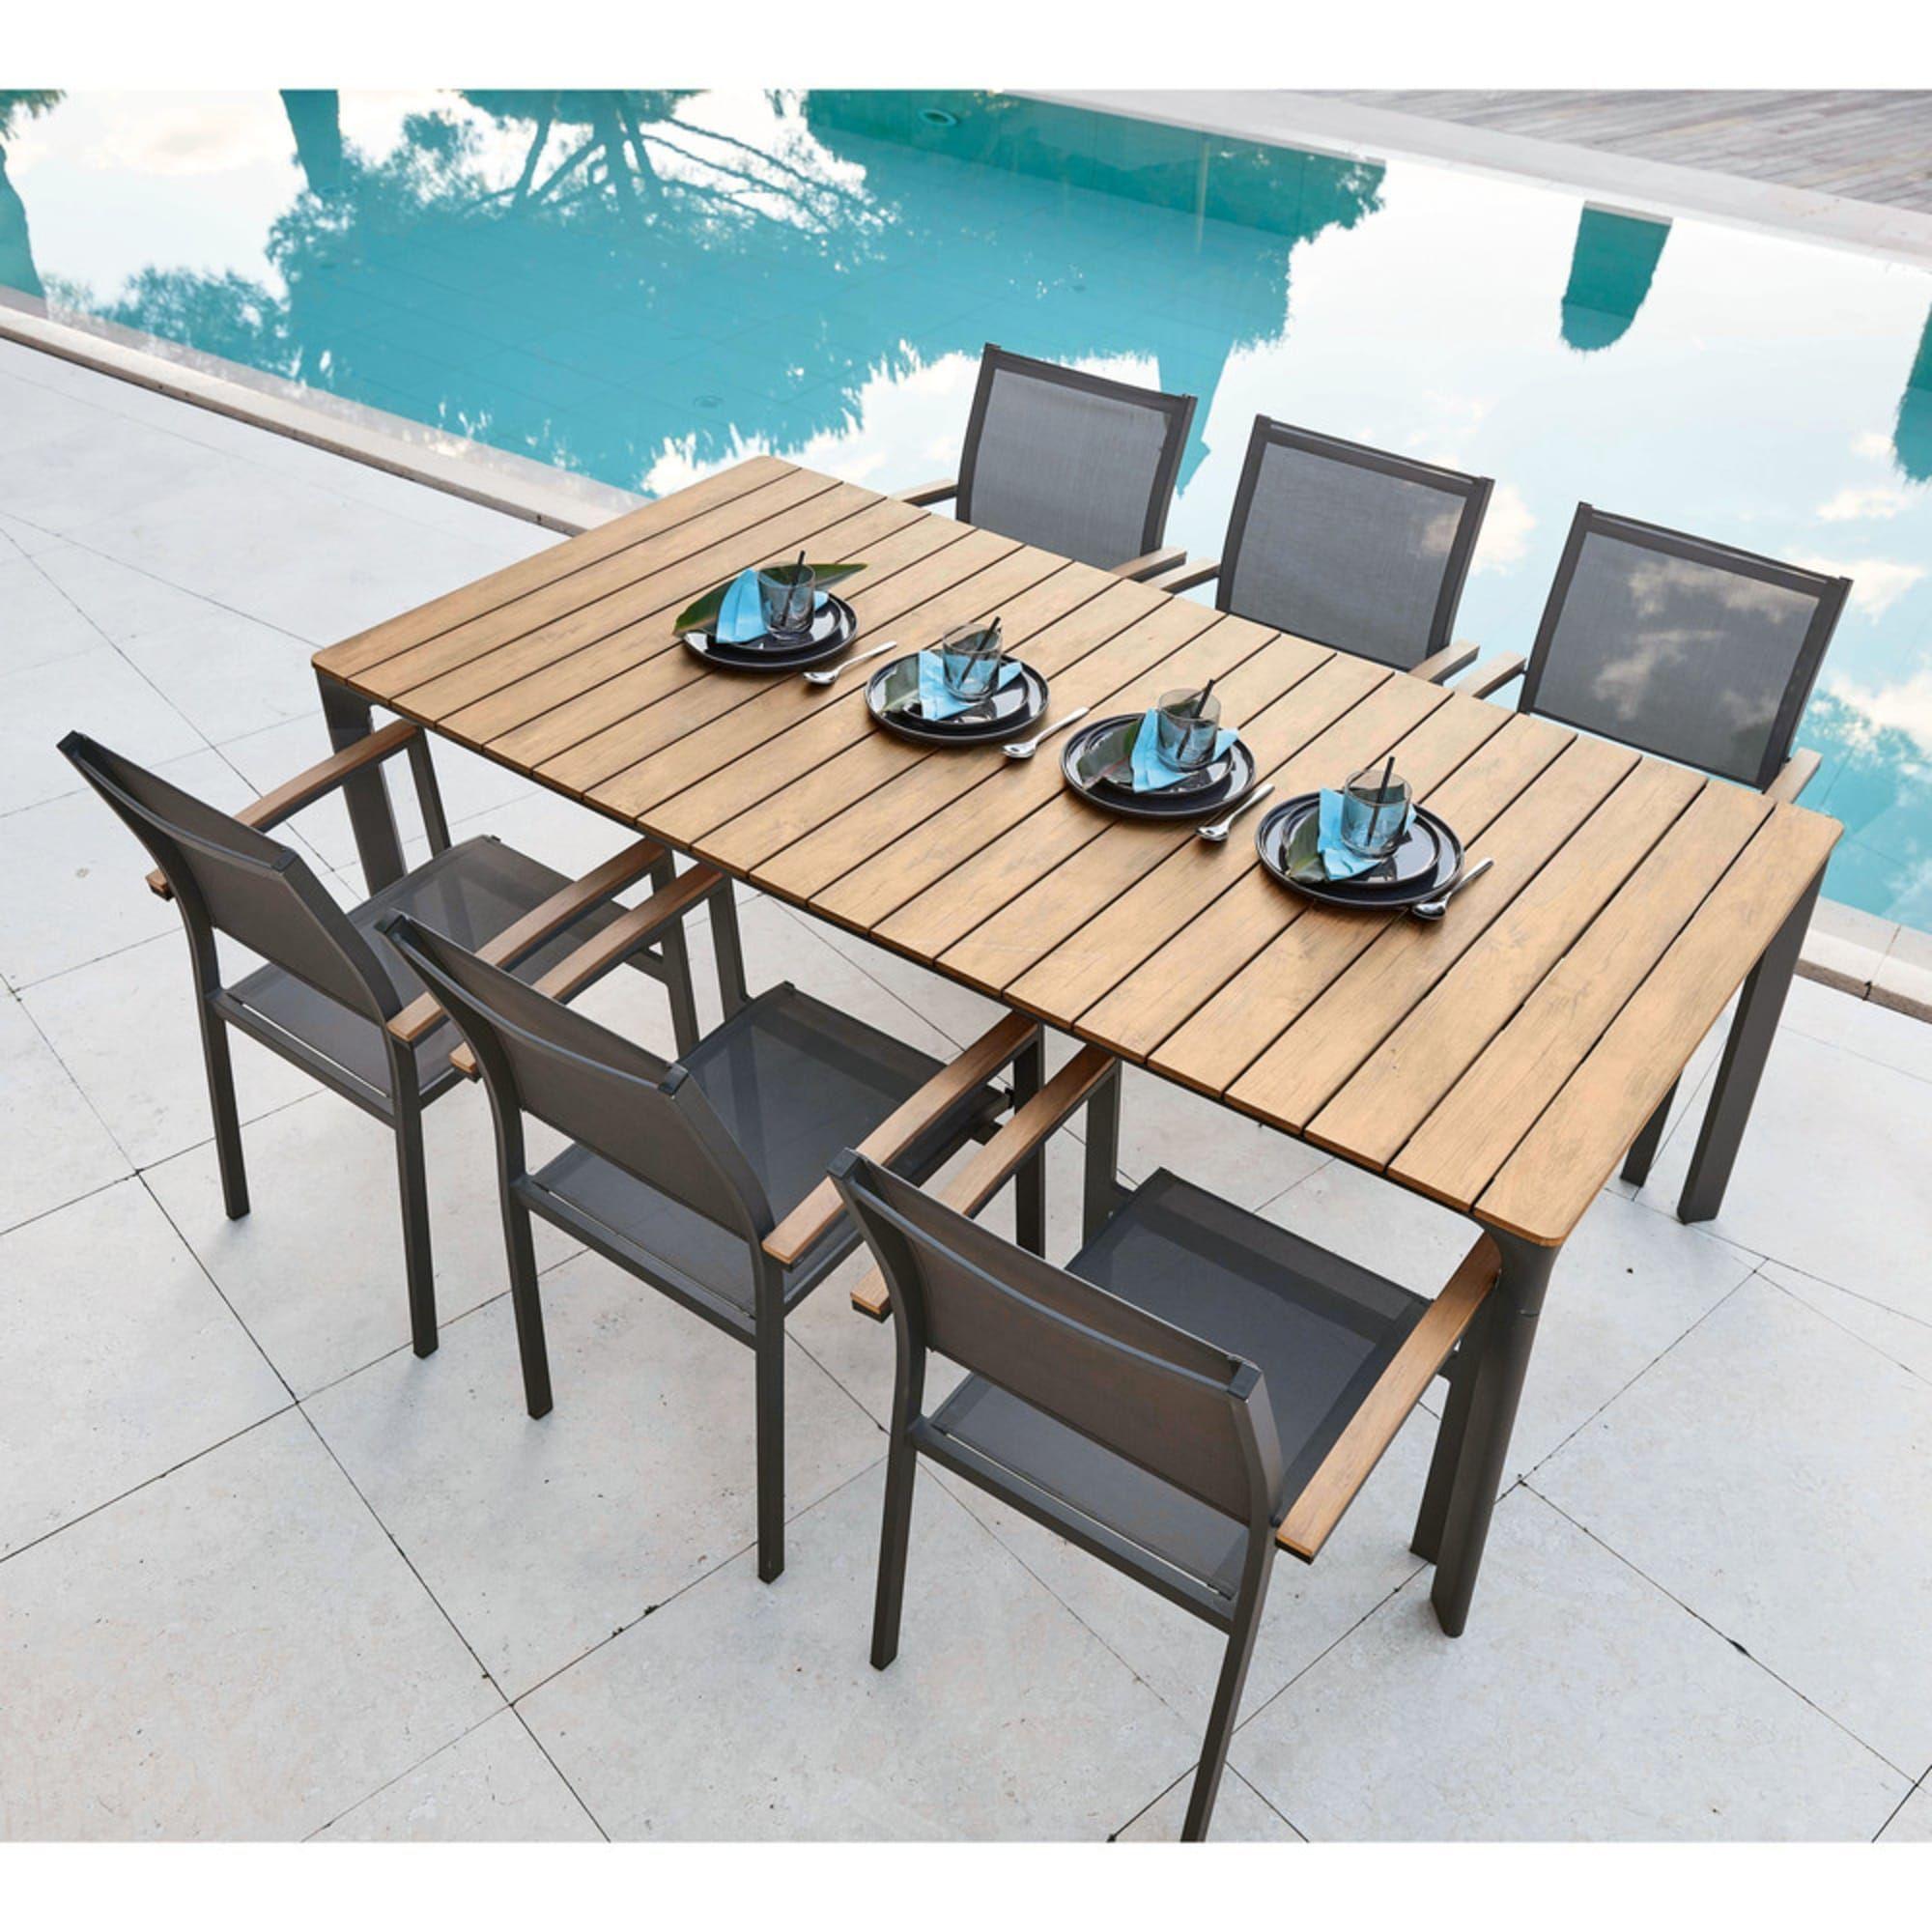 Gartentisch Aus Anthrazit Aluminium Fur 6 8 Personen L200 Maisons Du Monde Homemade Outdoor Furniture Garden Table Garden Table And Chairs